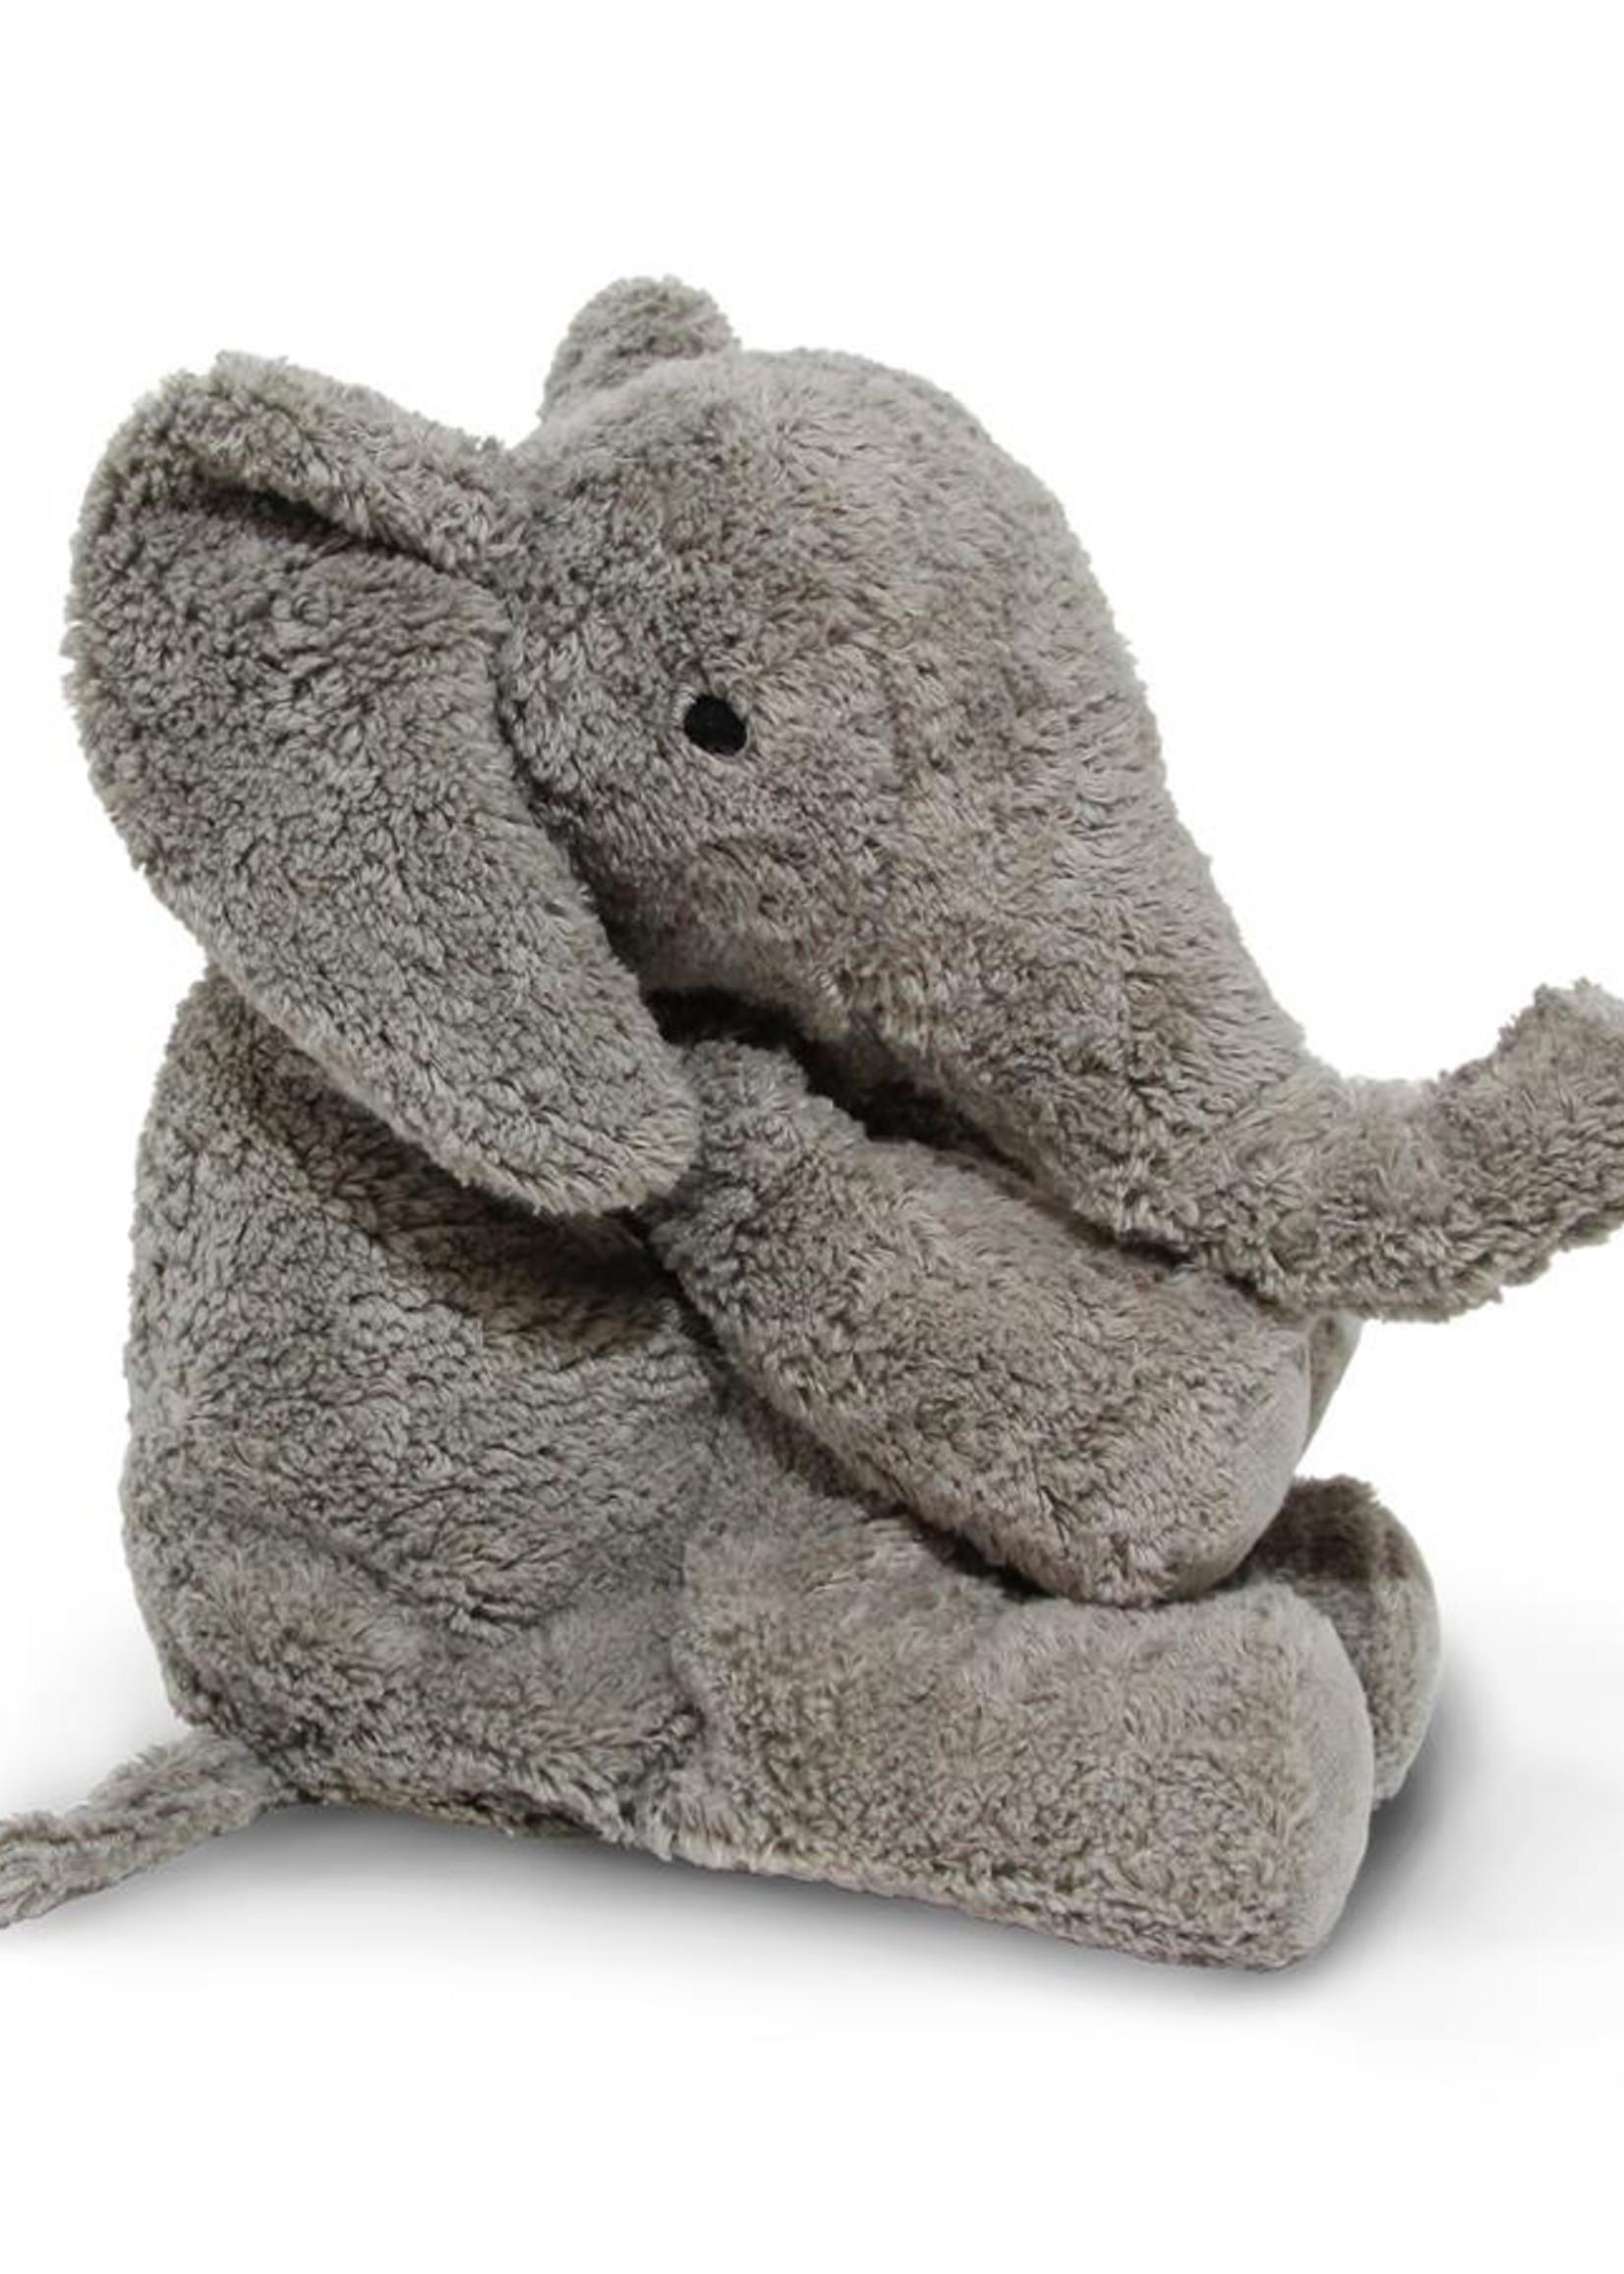 Senger Naturwelt Organic Cuddly Elephant - Small